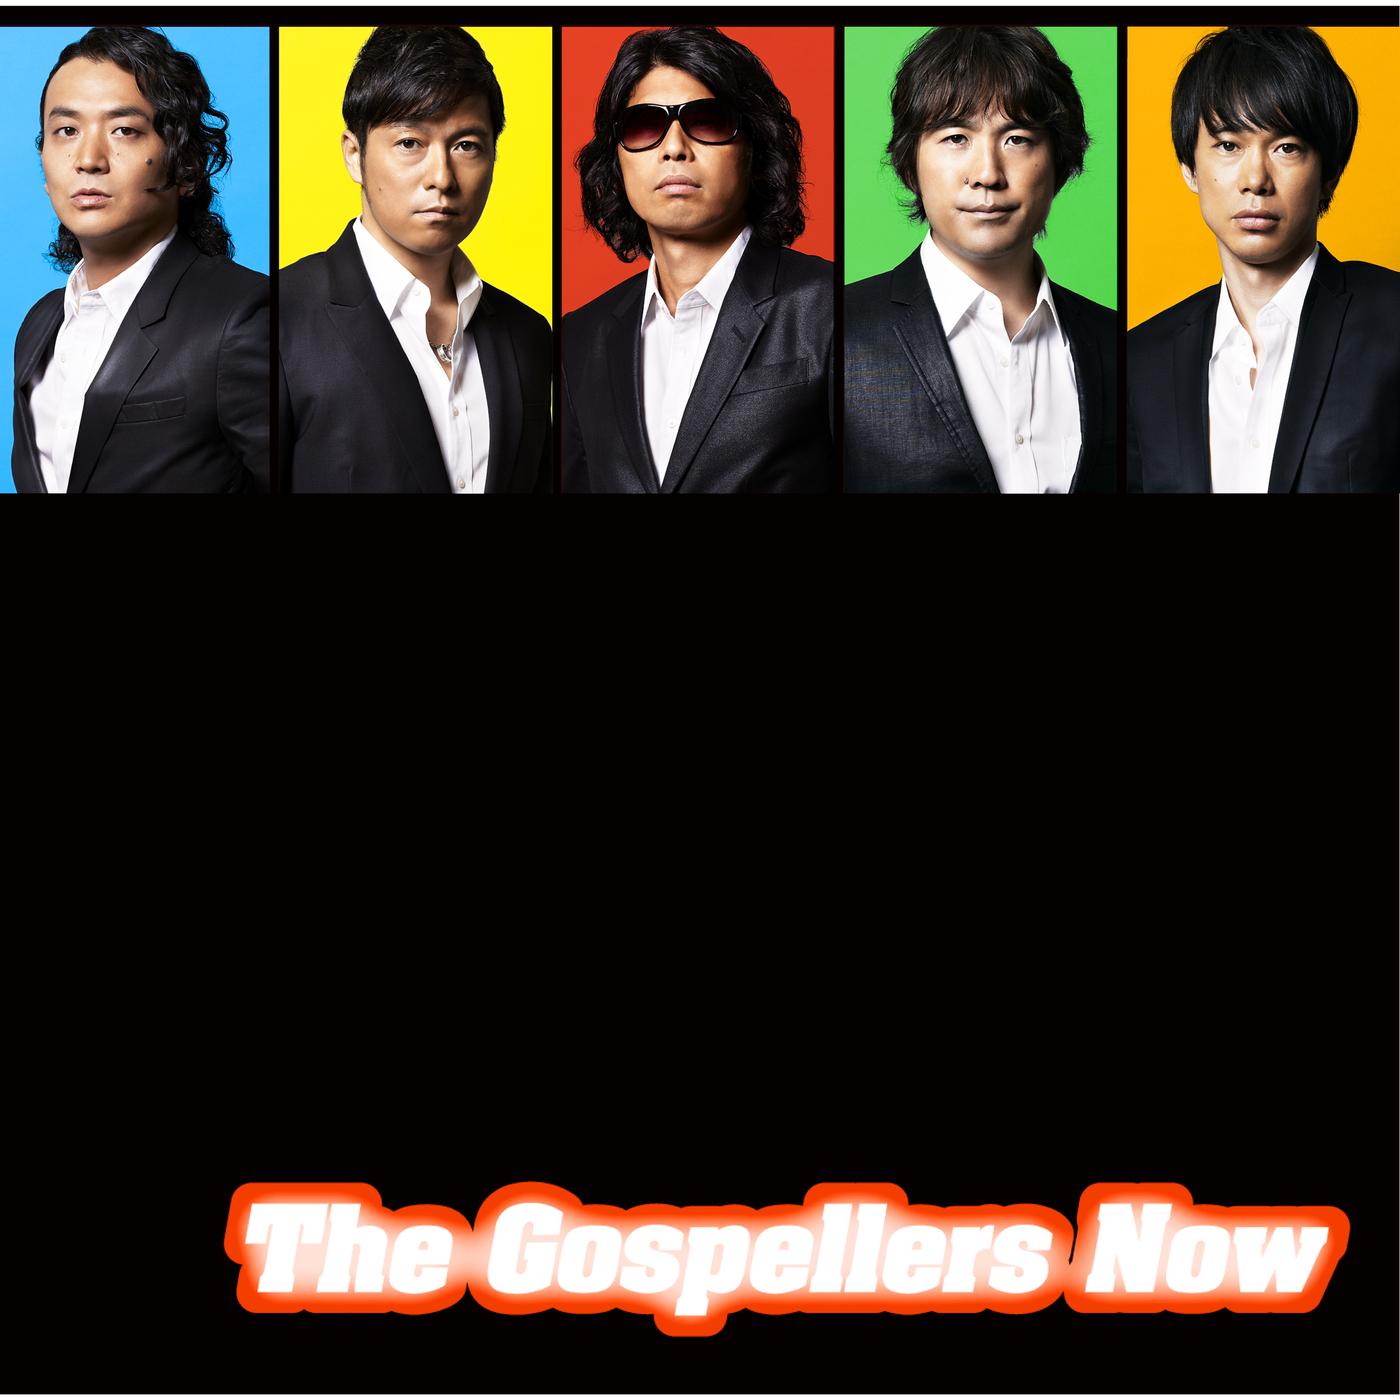 The Gospellers Now - The Gospellers